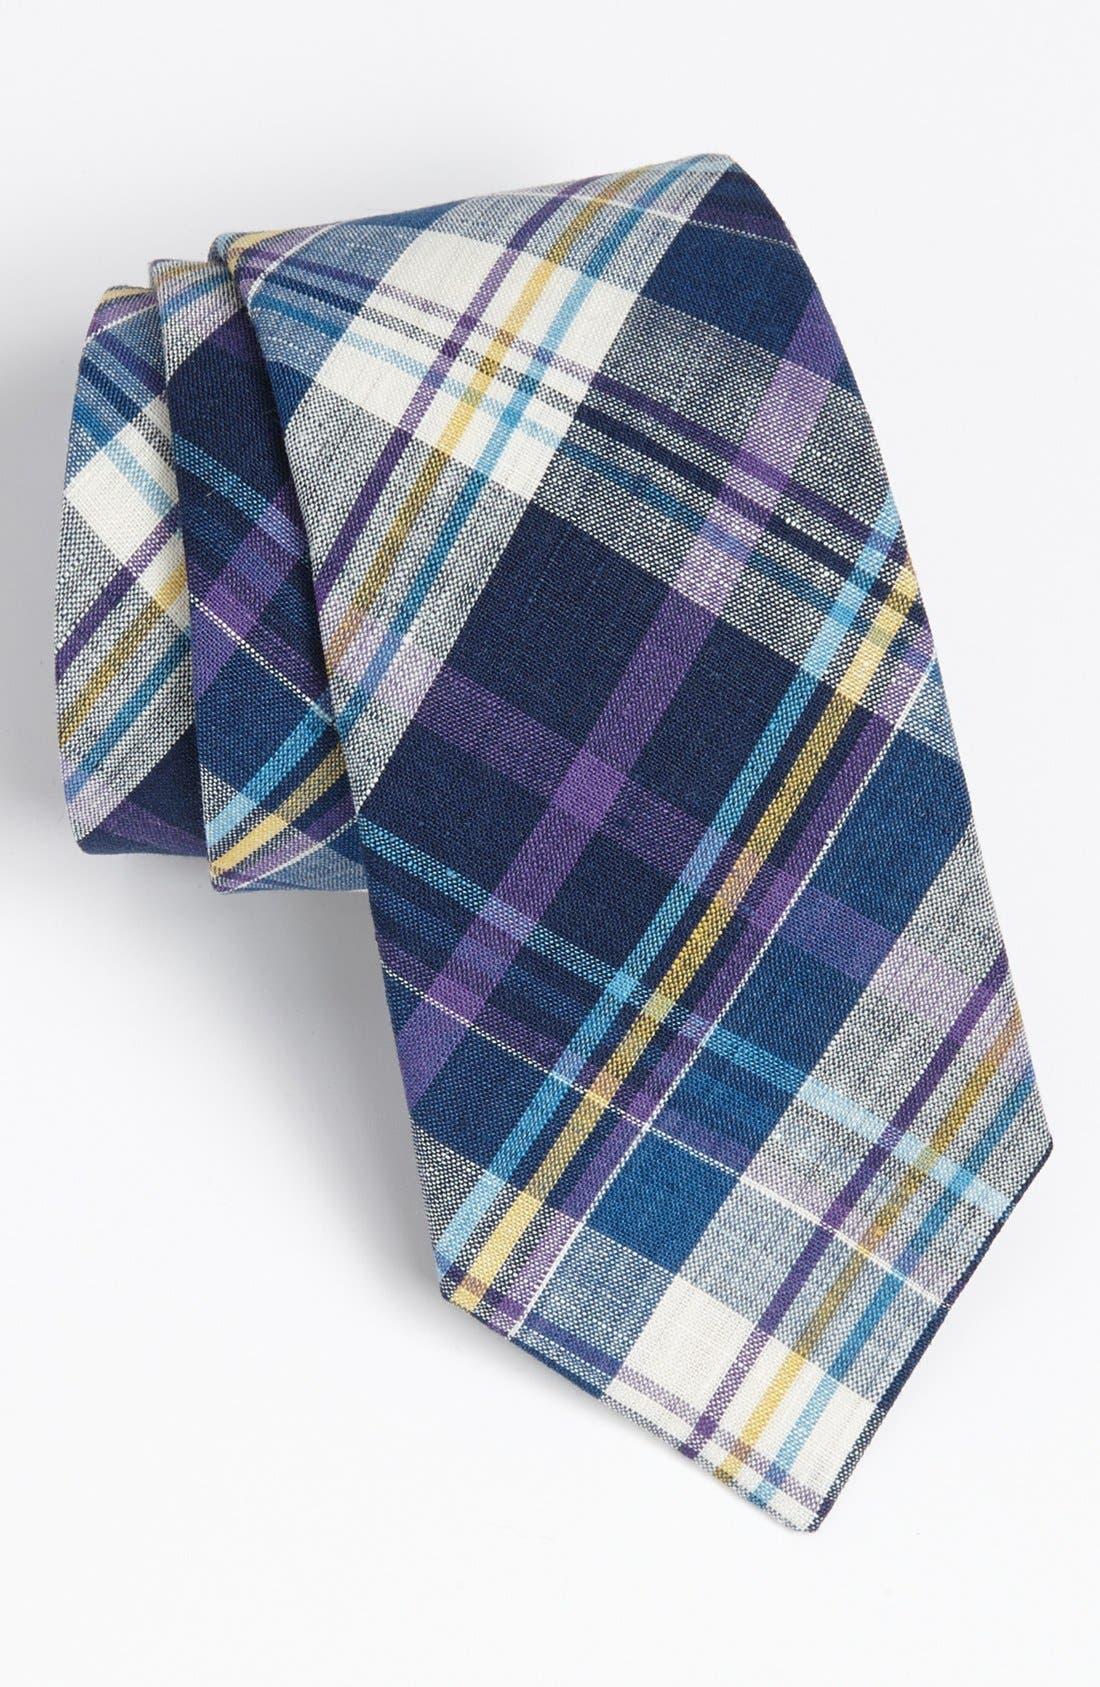 ROBERT STEWART Woven Tie, Main, color, 500